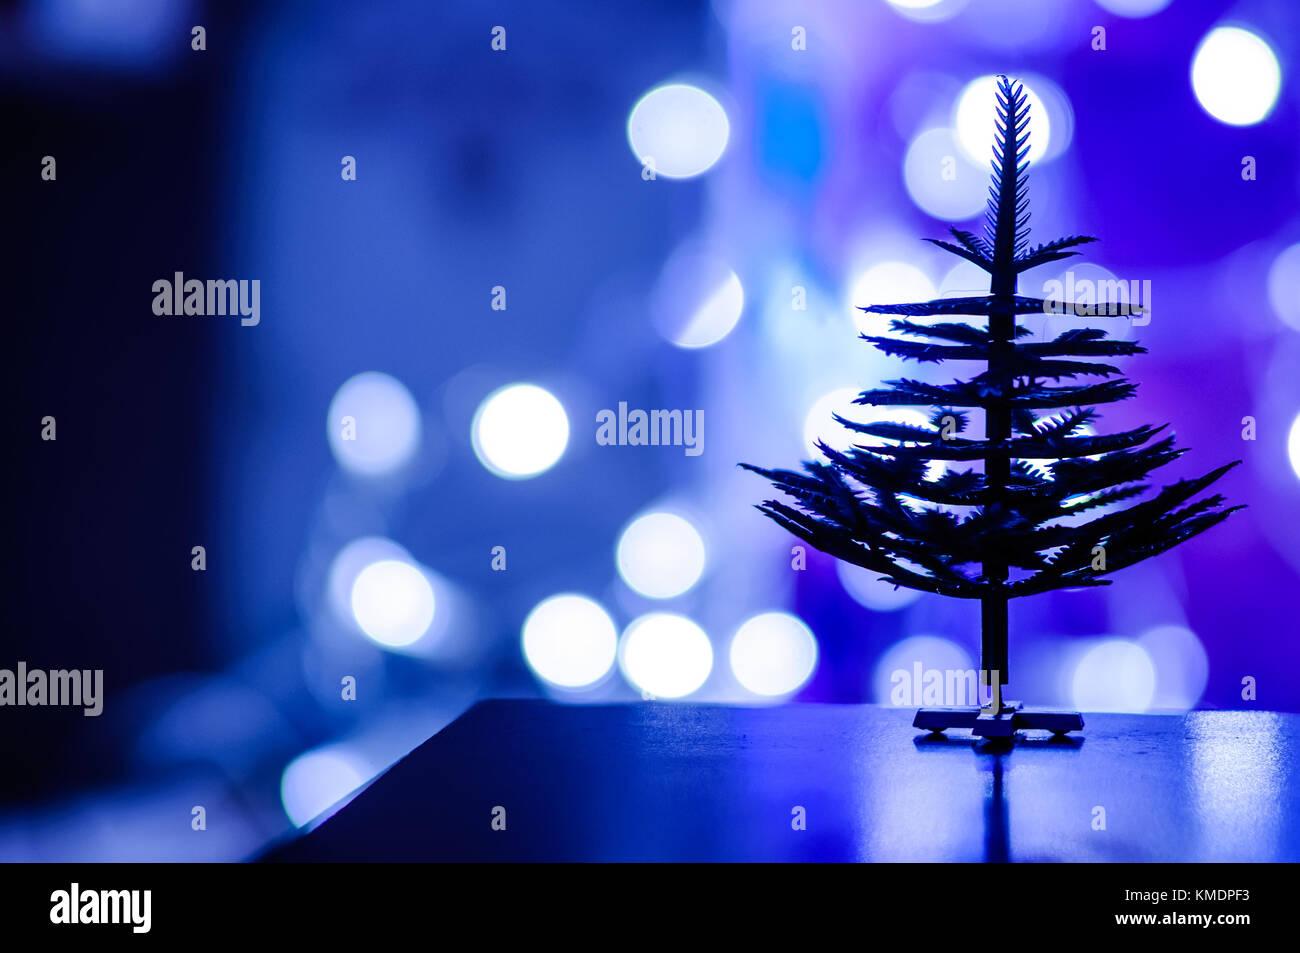 Blue christmas tinsel texture background stock photos & blue